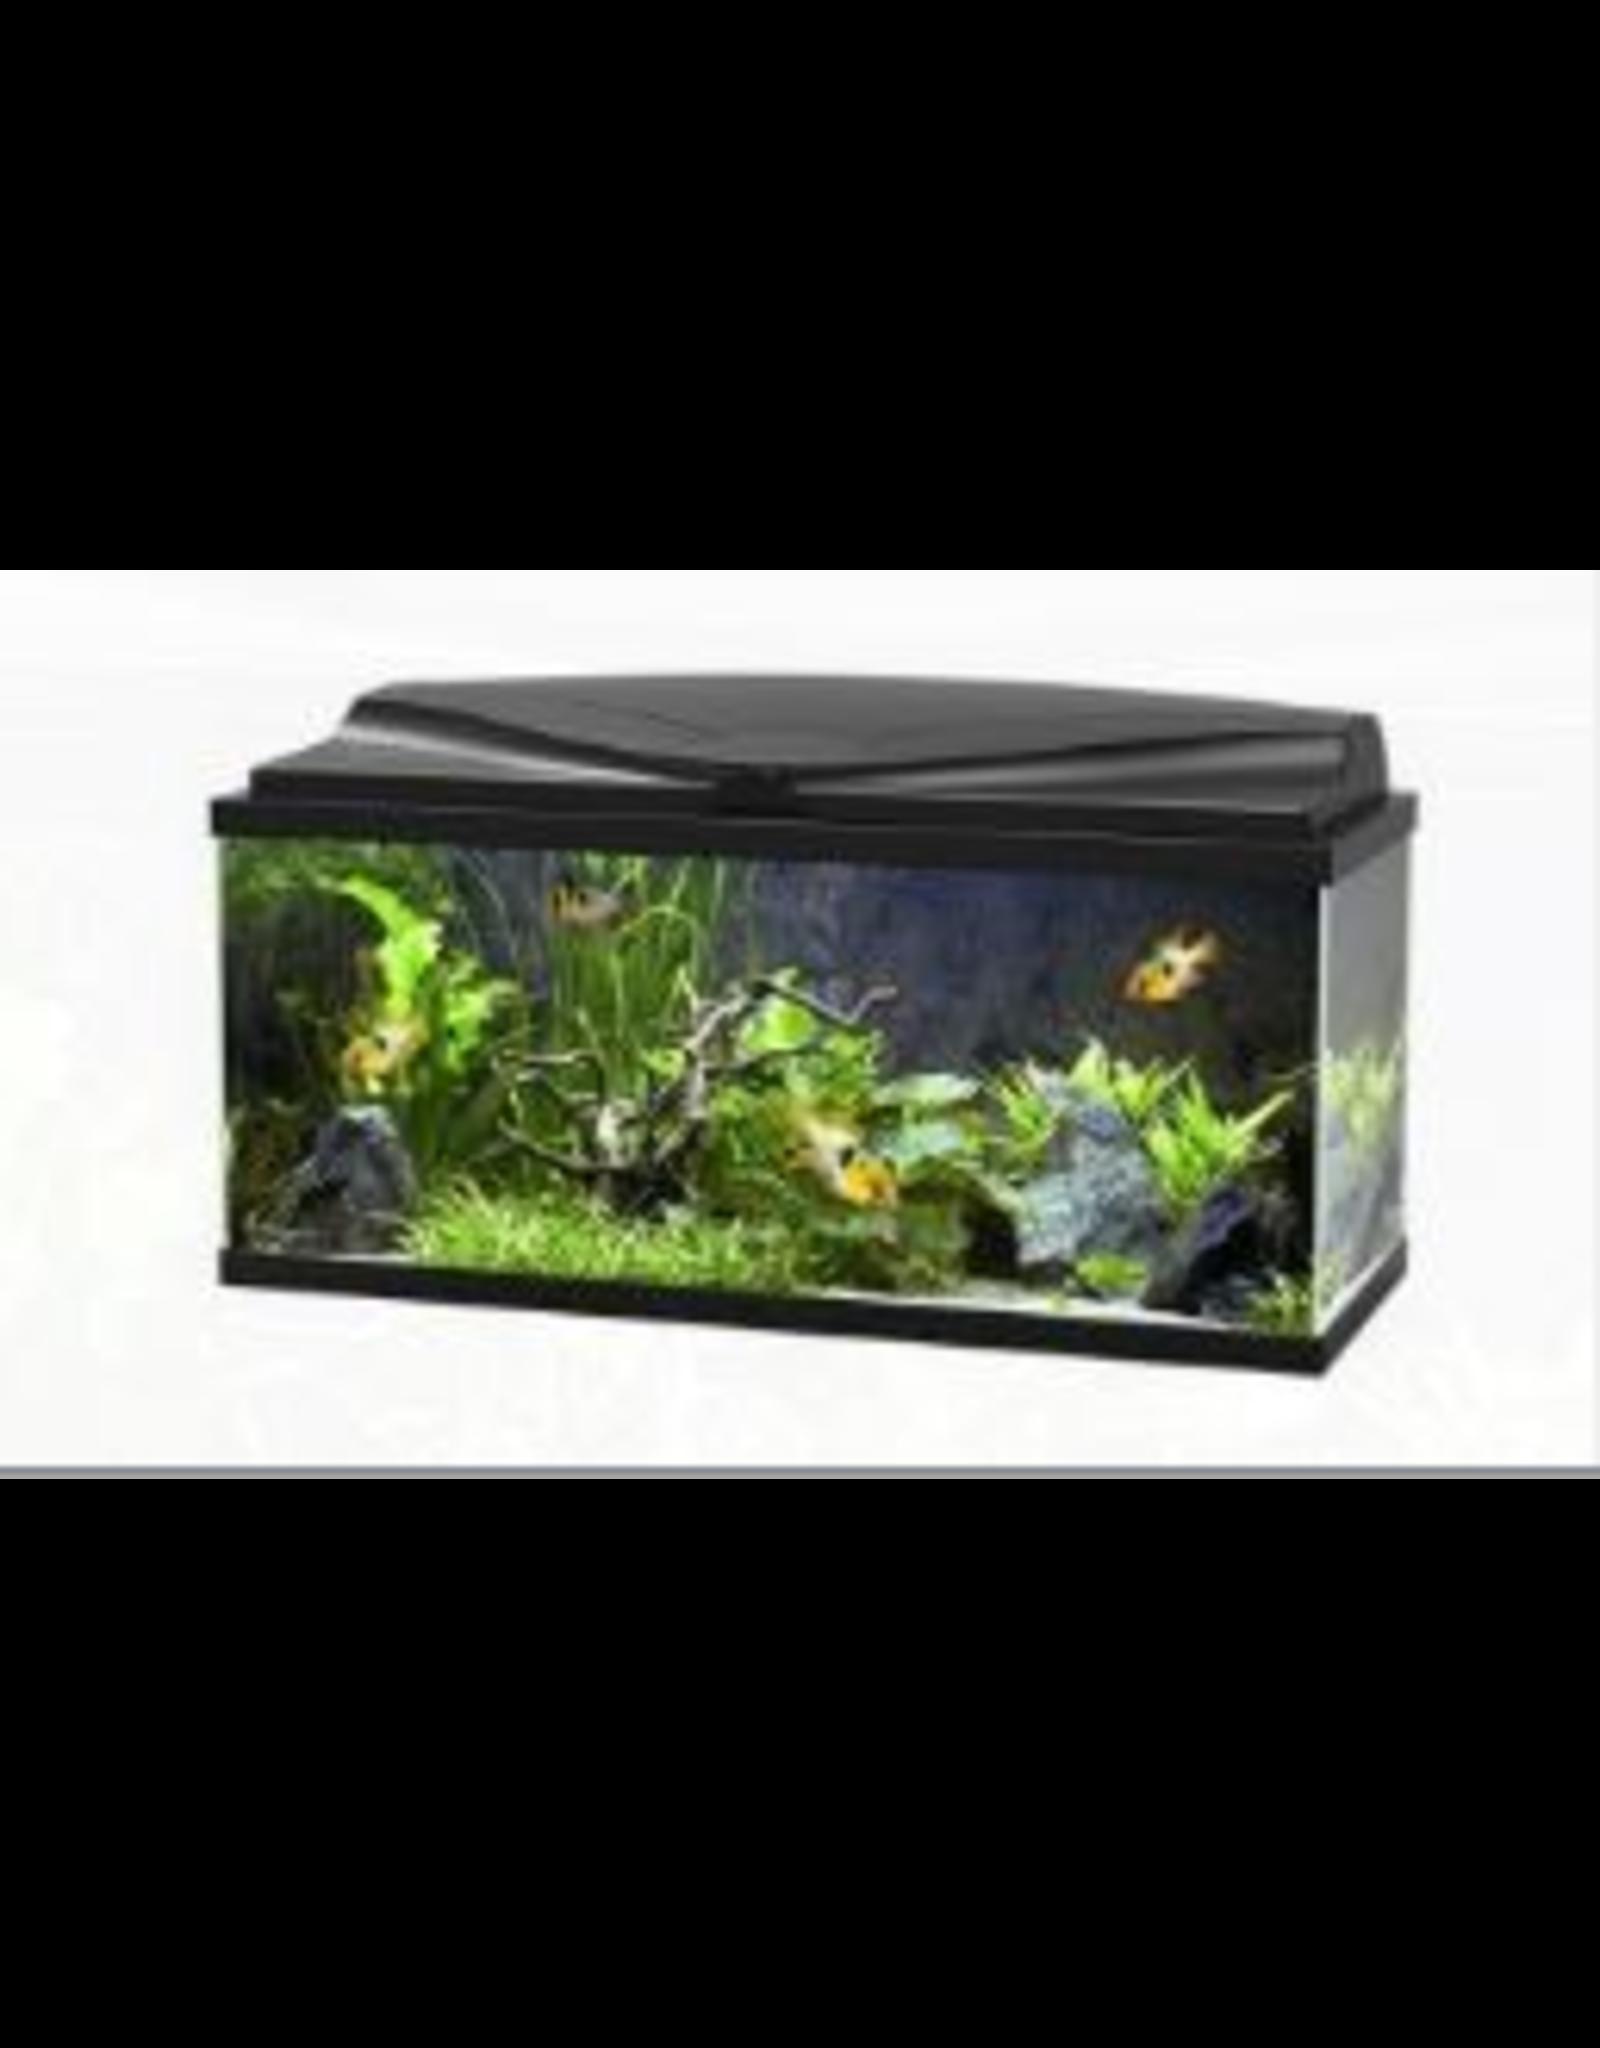 Ciano Ciano 80 LED Aquarium Black